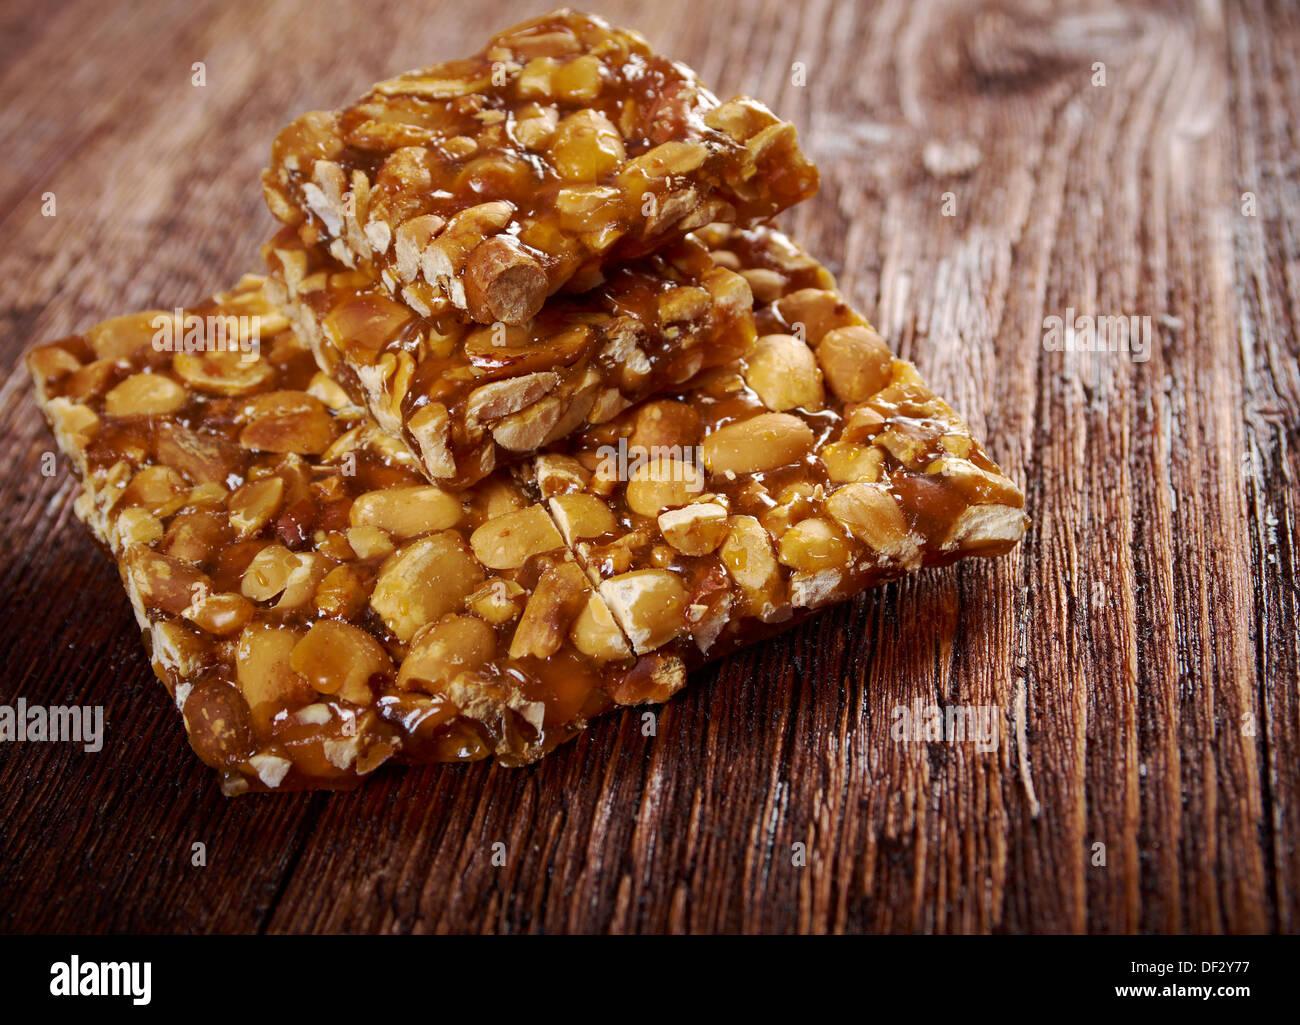 Croquants aux arachides sweet hard on wooden table Photo Stock